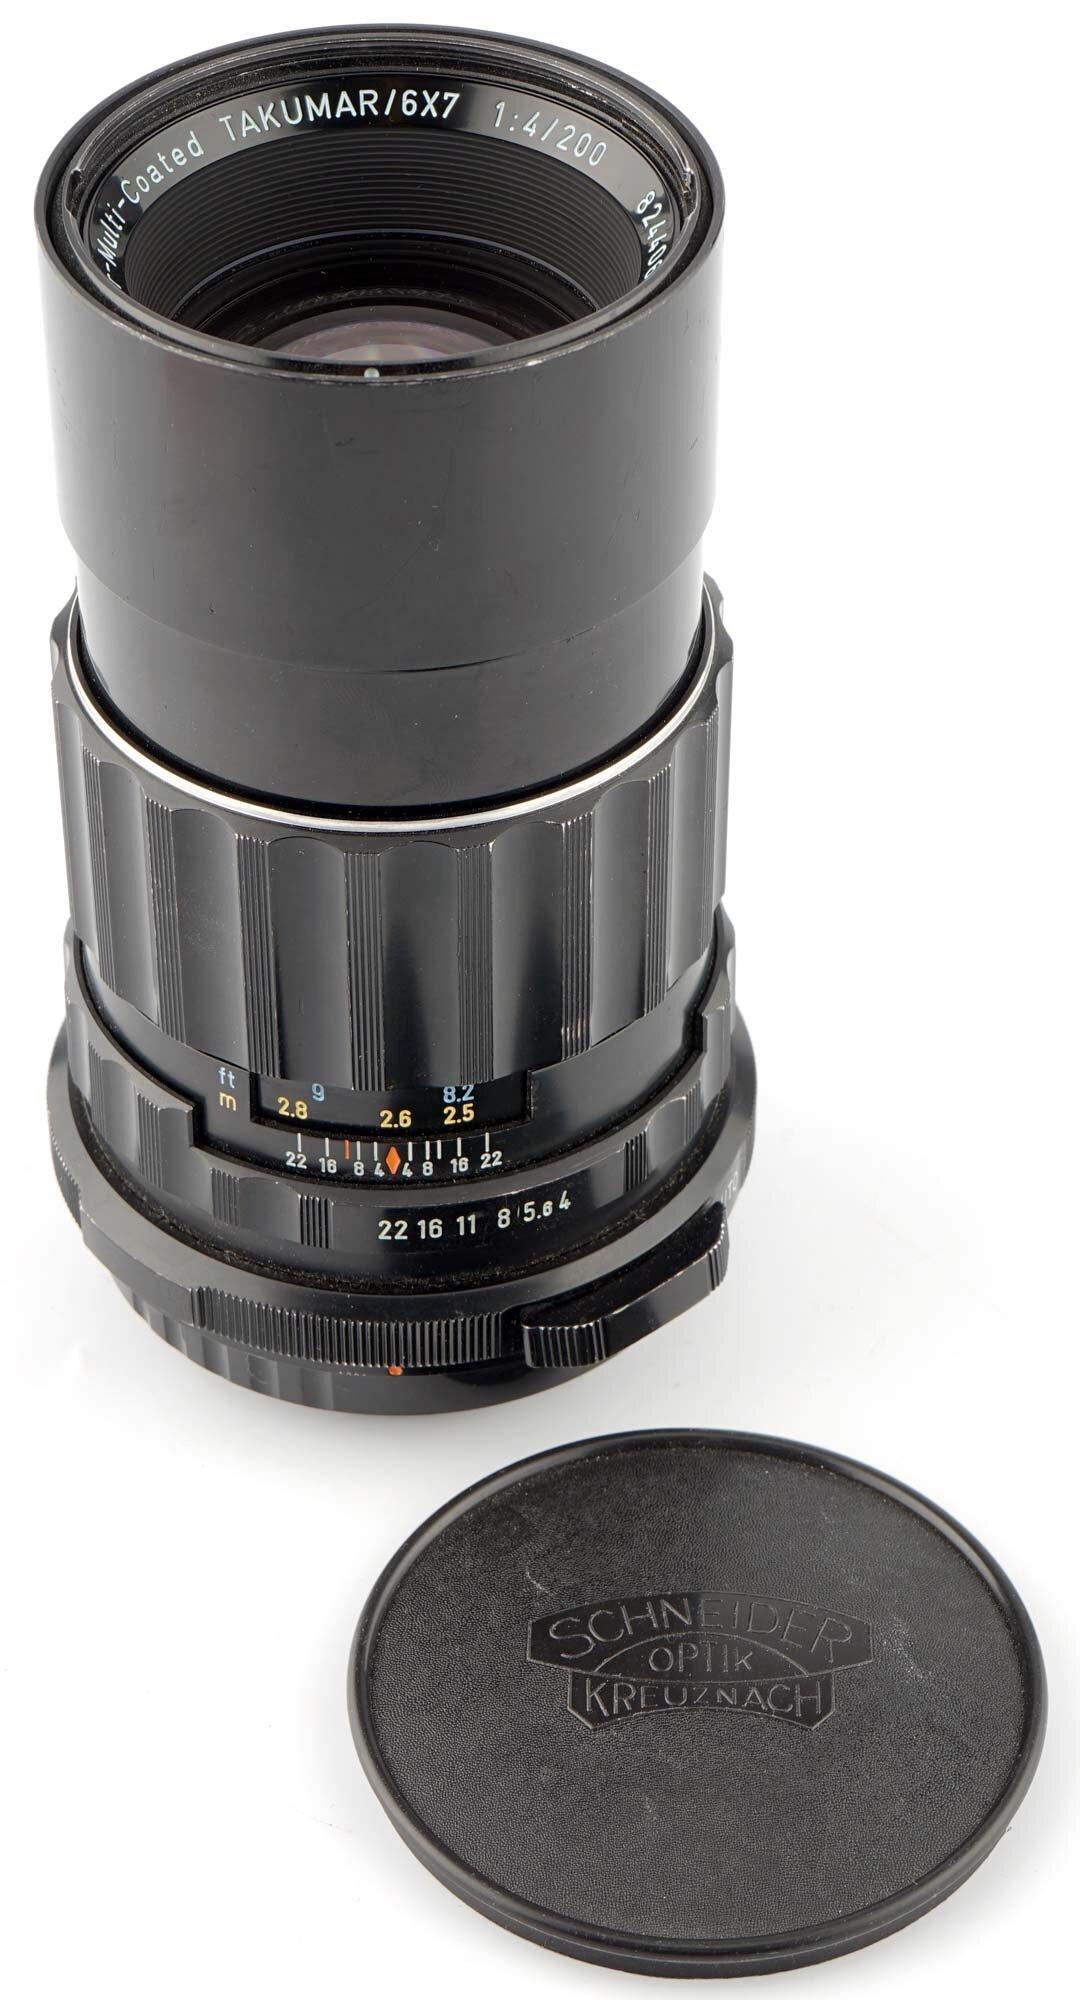 Pentax Asahi Super MC Takumar / 6x7 1:4,0/200mm